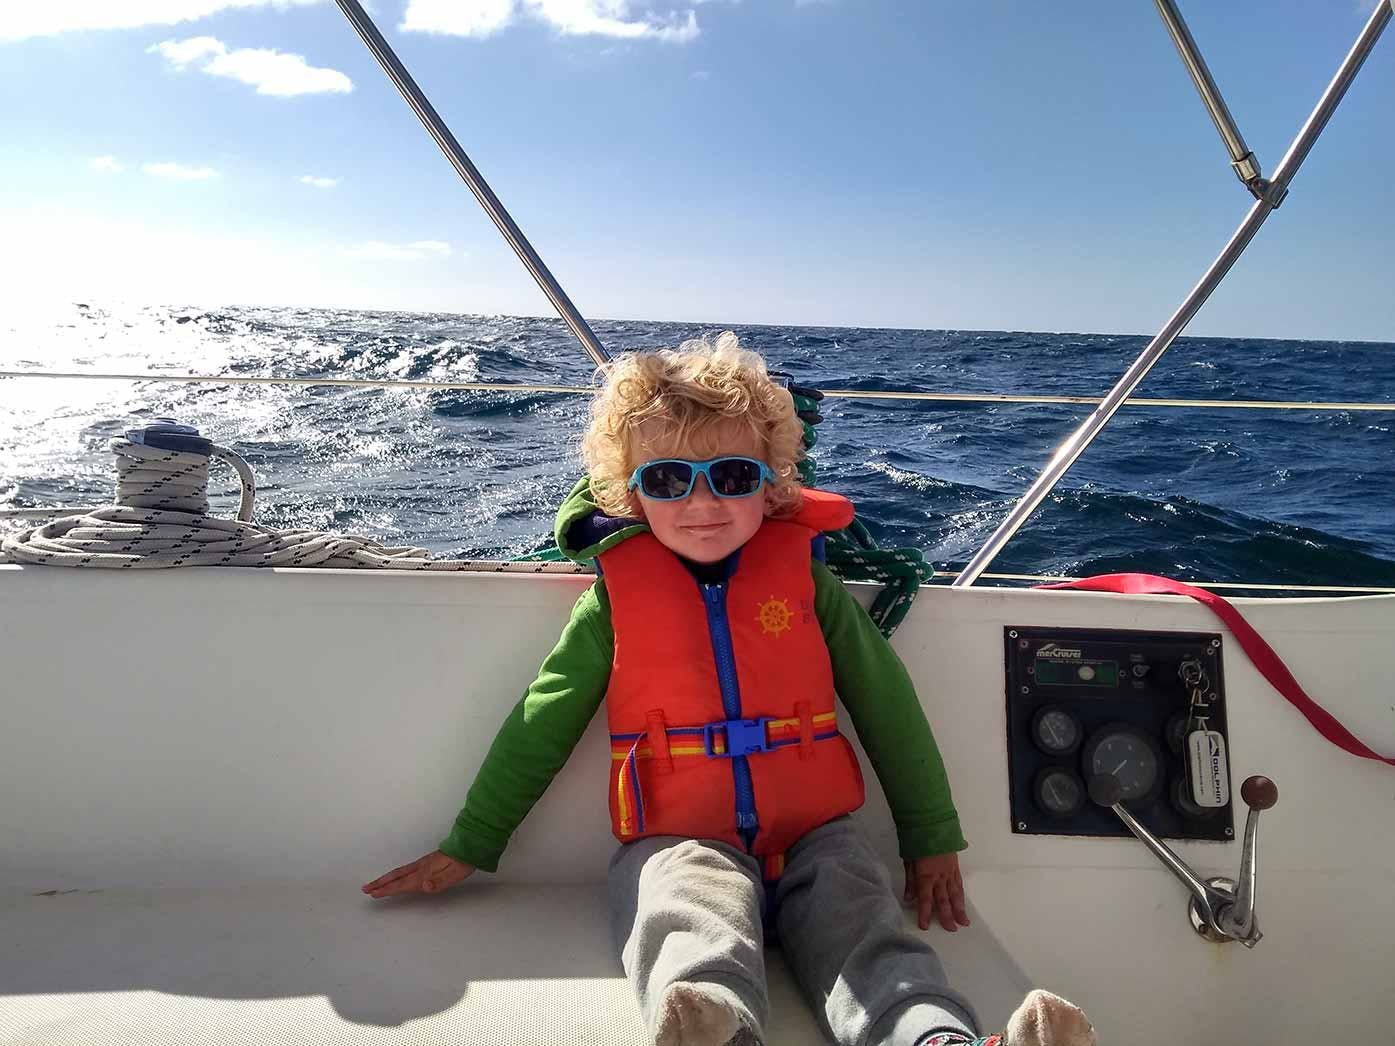 sleeping on a boat- image of little boy on boat